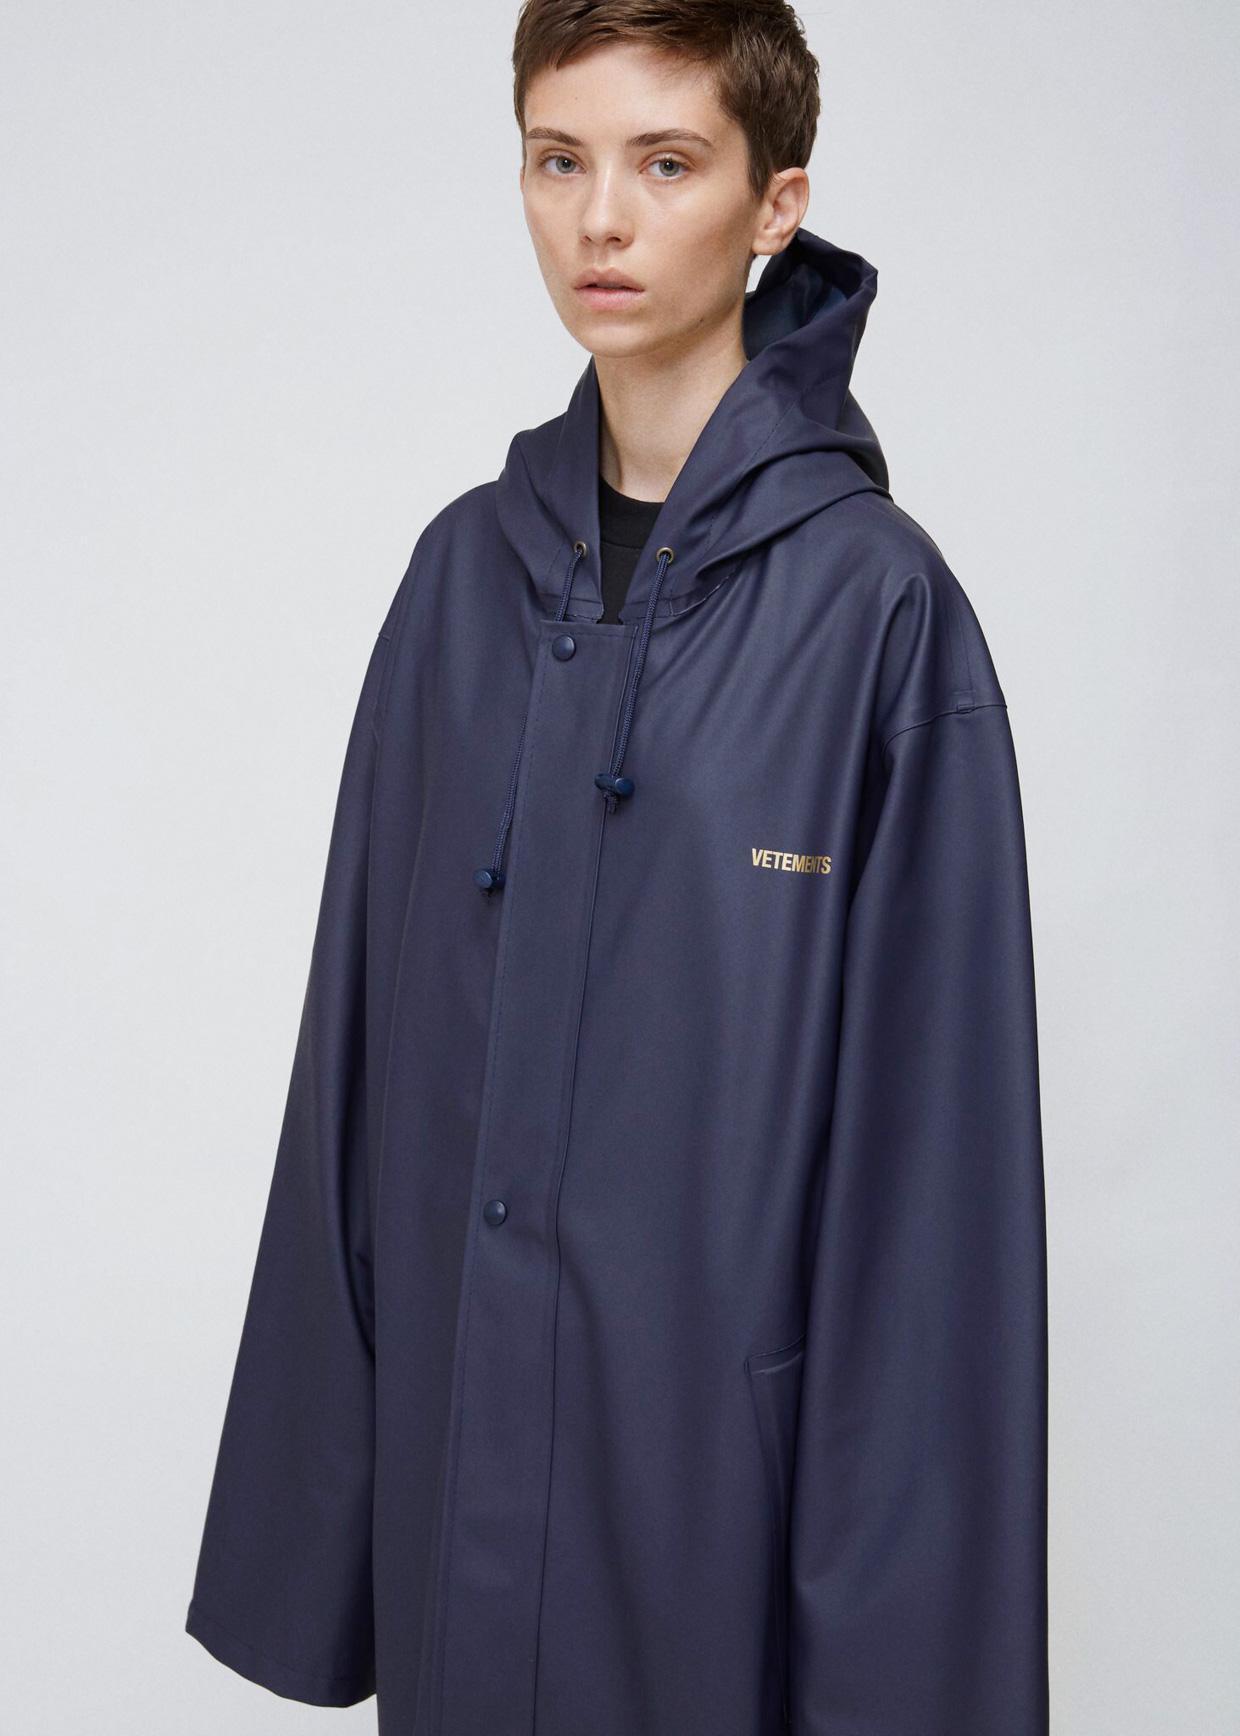 Lyst Vetements Navy Raincoat In Blue